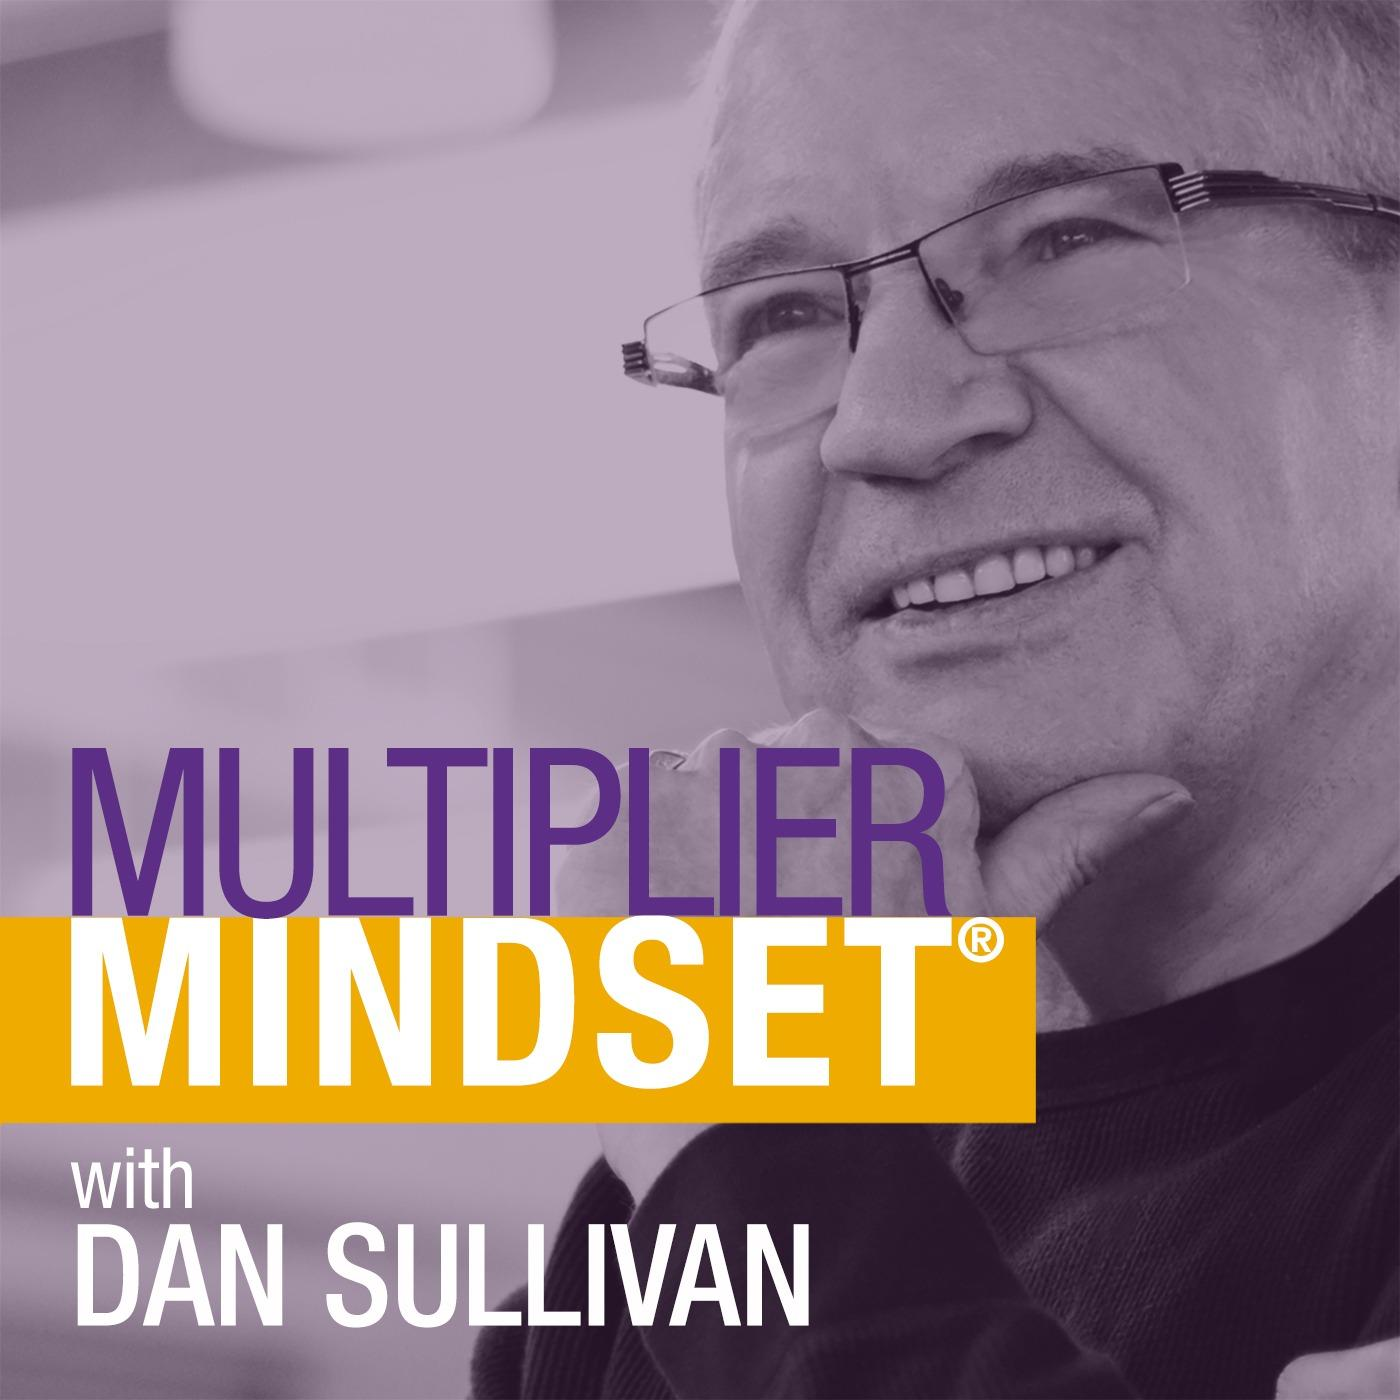 Multiplier Mindset® with Dan Sullivan